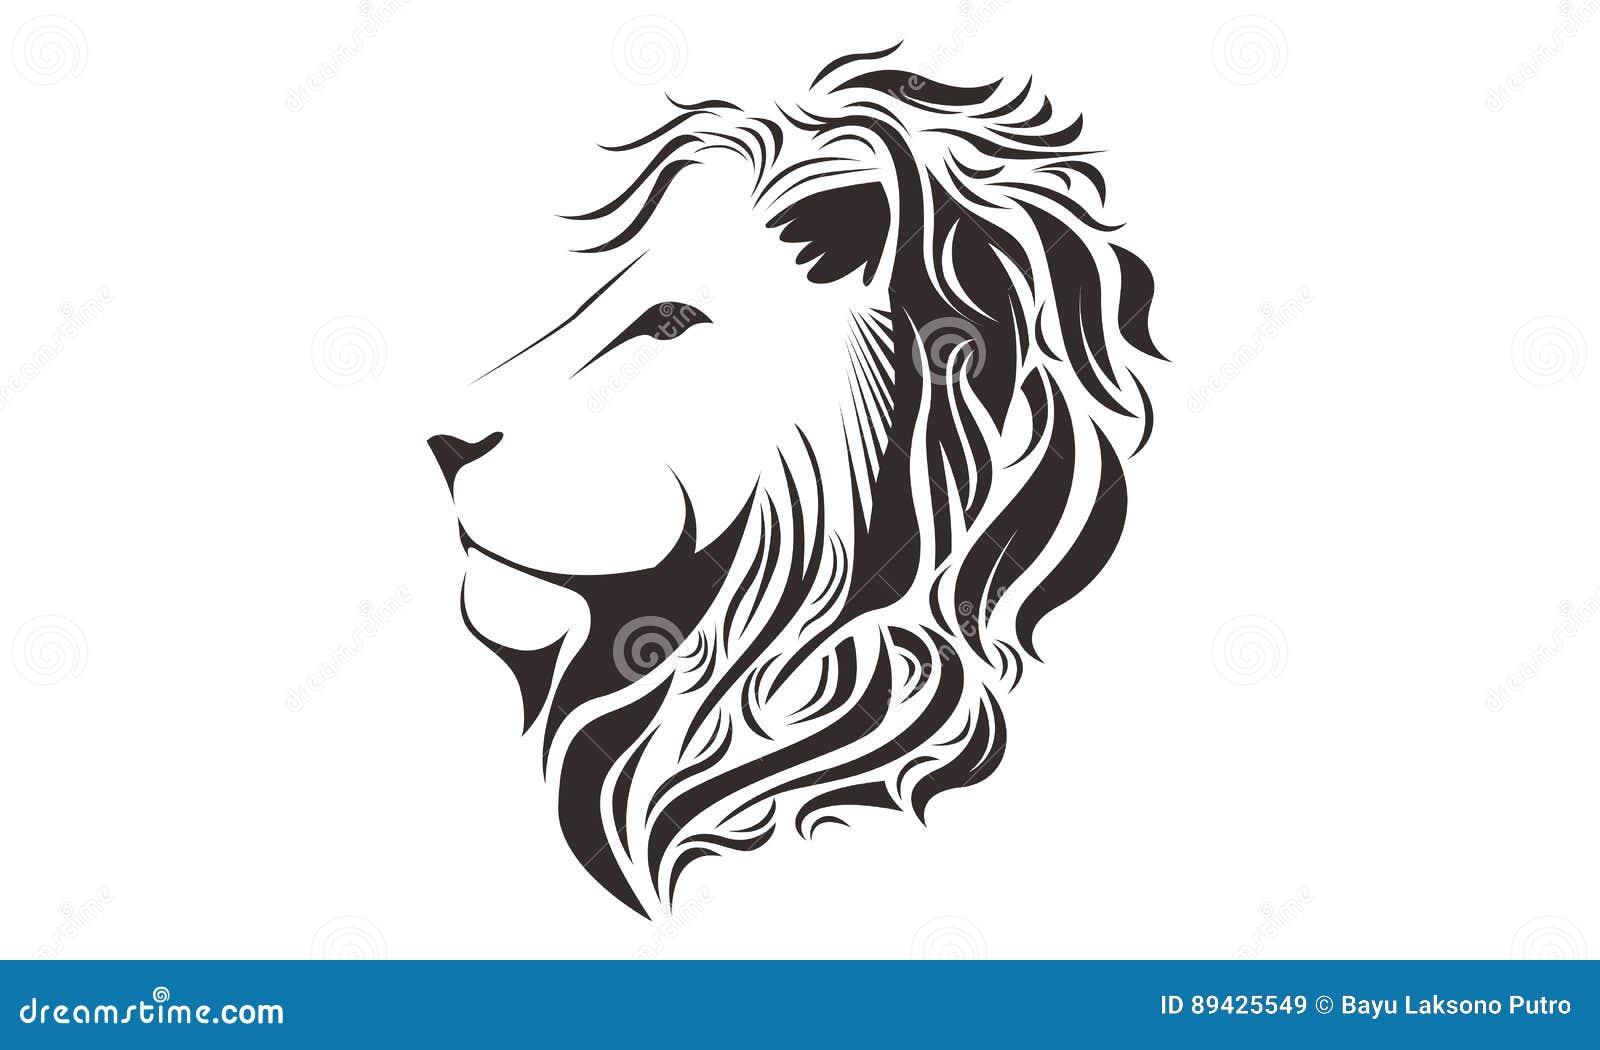 Lion Head Drawing Stock Illustrations 6 032 Lion Head Drawing Stock Illustrations Vectors Clipart Dreamstime Illustration of lion face outline royalty free cliparts vectors. dreamstime com